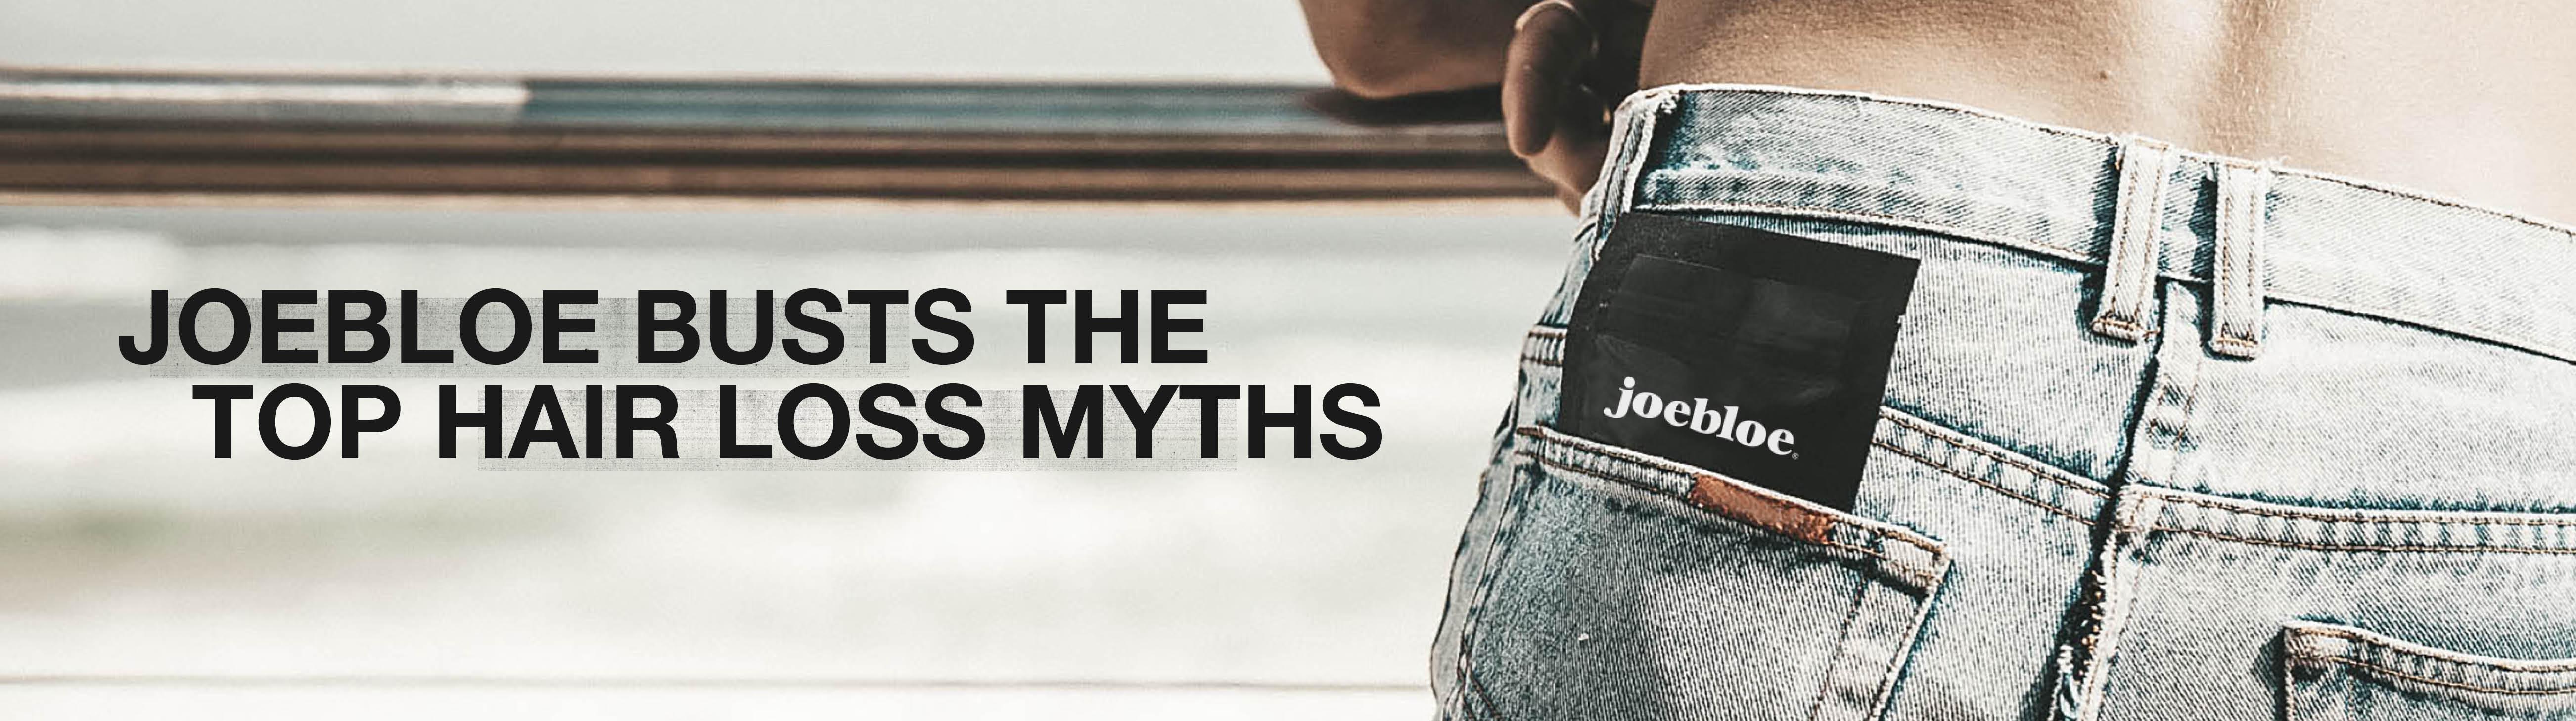 joebloe-hair-loss-myths